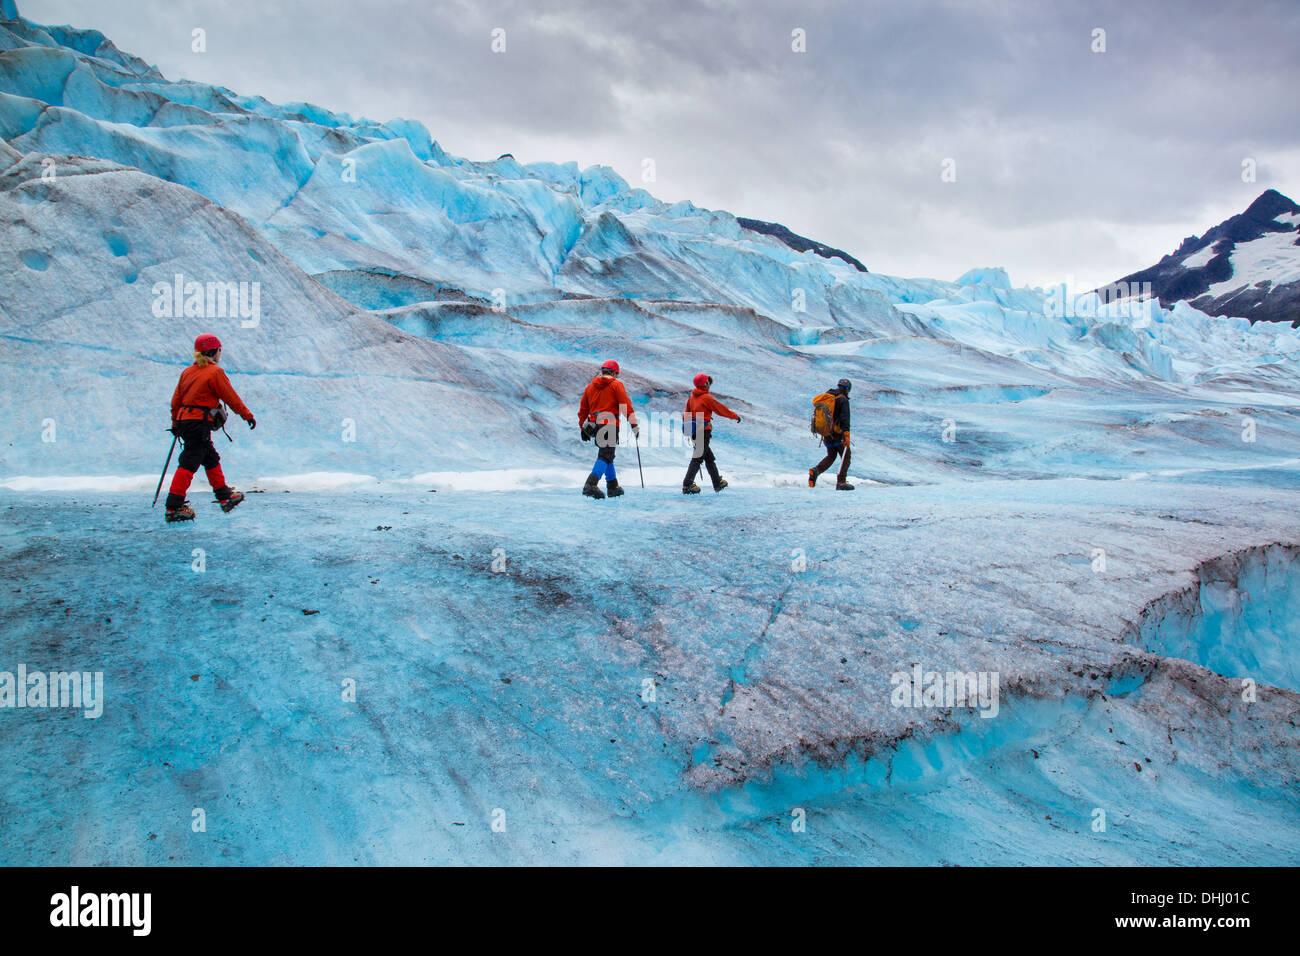 Quatre personnes marchant sur Mendenhall Glacier, Alaska, USA Photo Stock